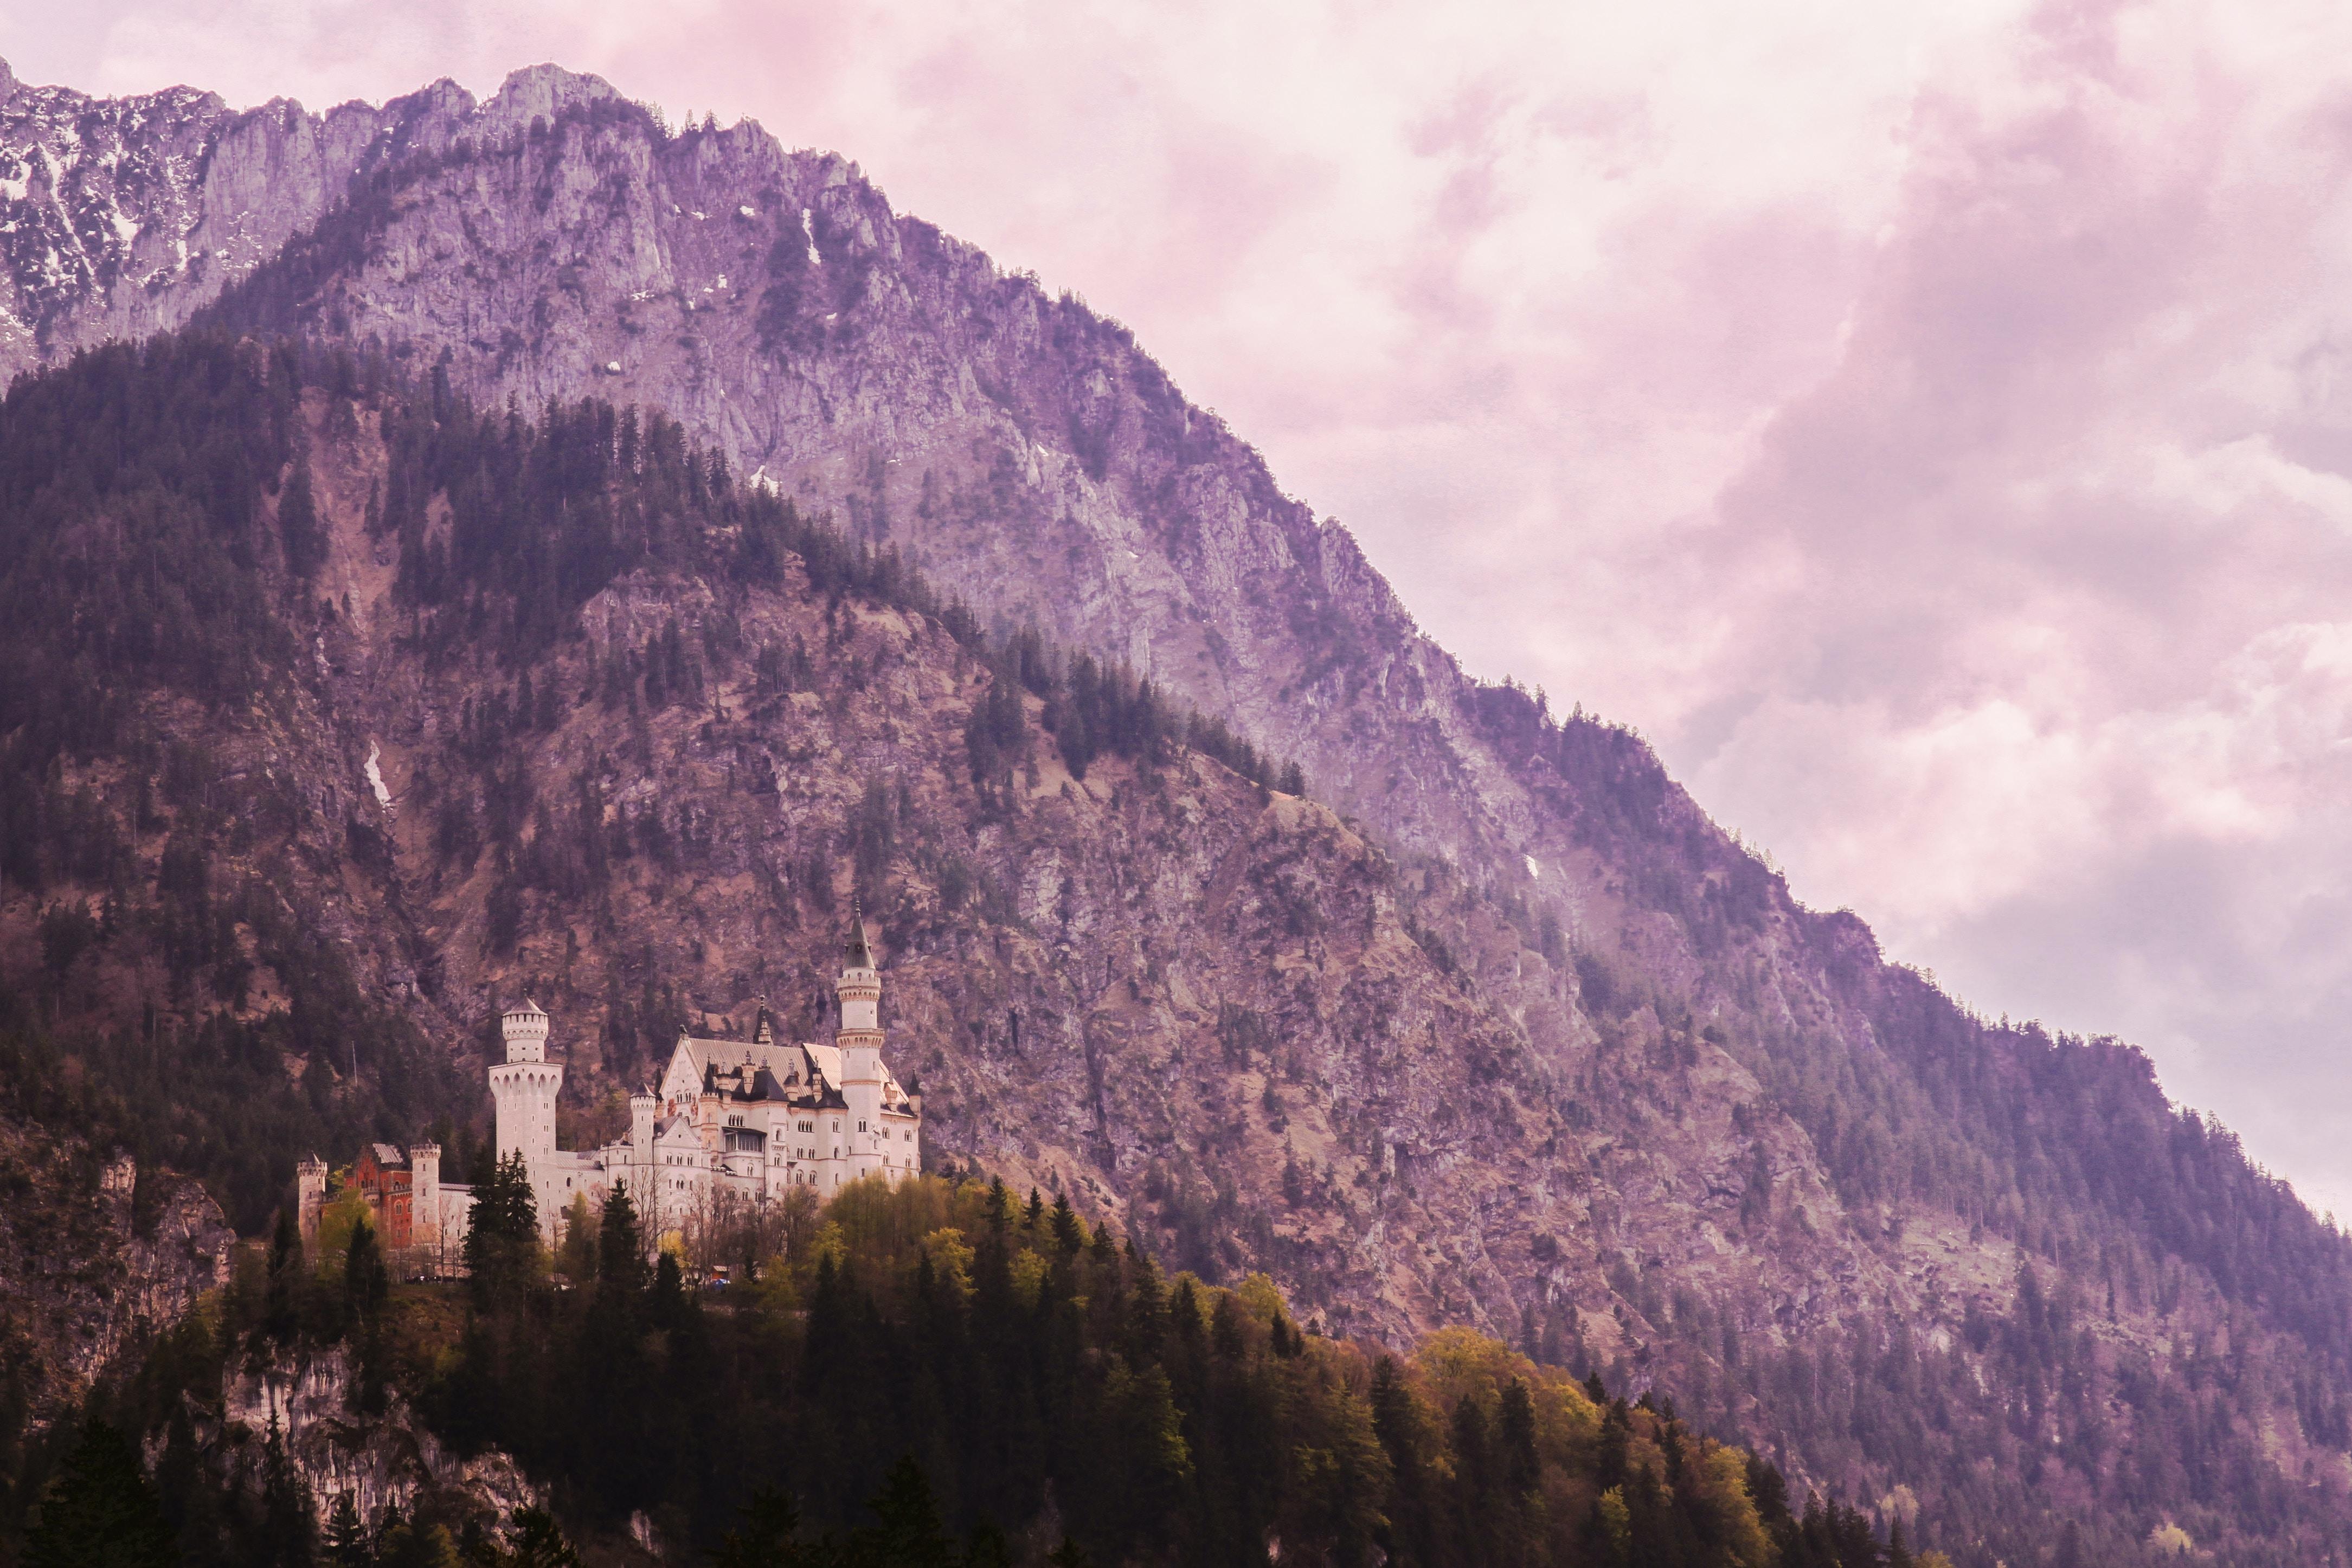 Tall purple-hued mountain towering over Neuschwanstein Castle